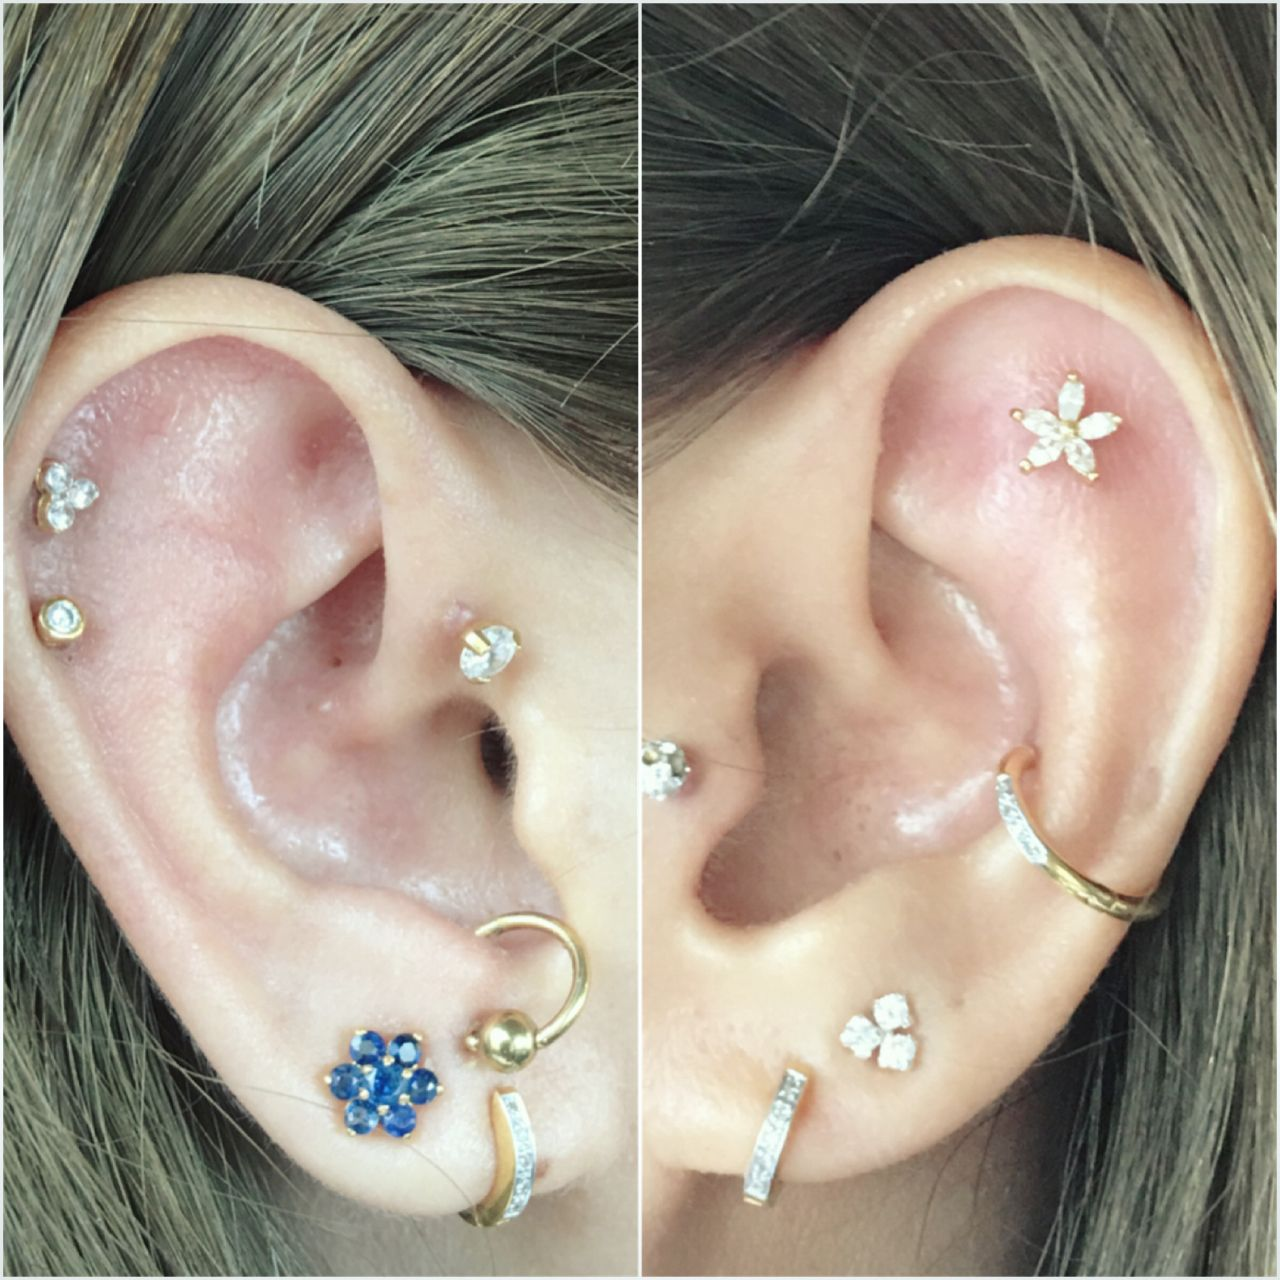 Healed nose piercing hole  Pin by Esmera on Earrings  Pinterest